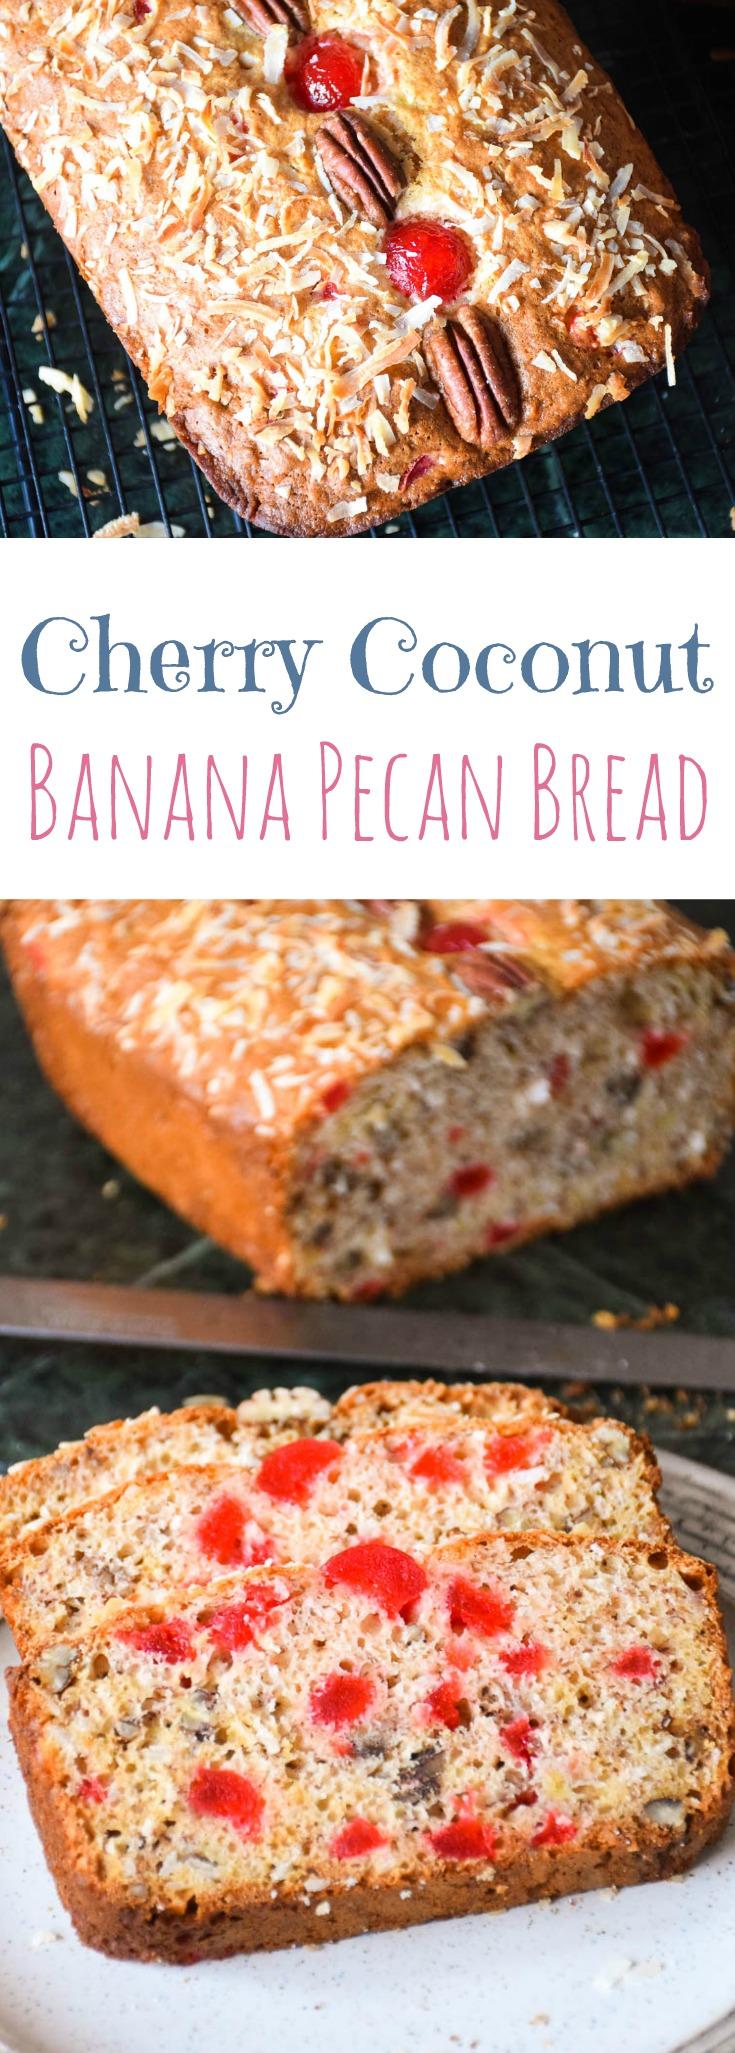 Cherry Coconut Banana Pecan Bread